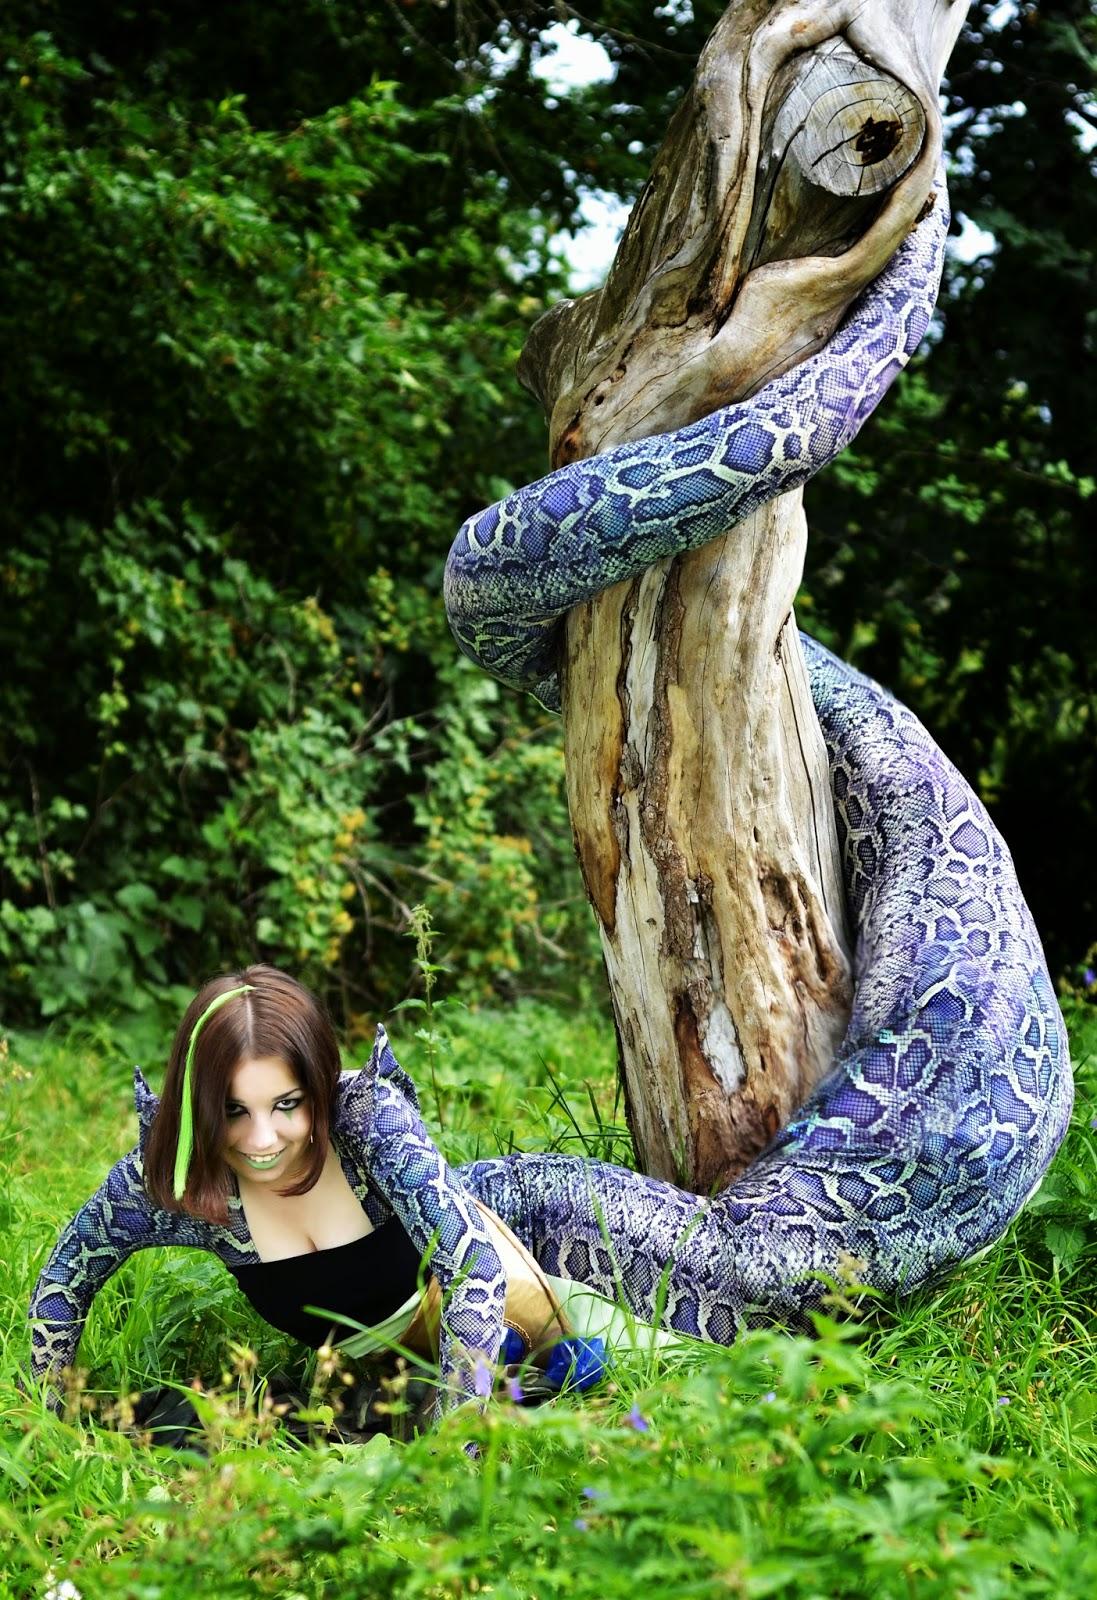 superbe cosplay d'une femme serpent